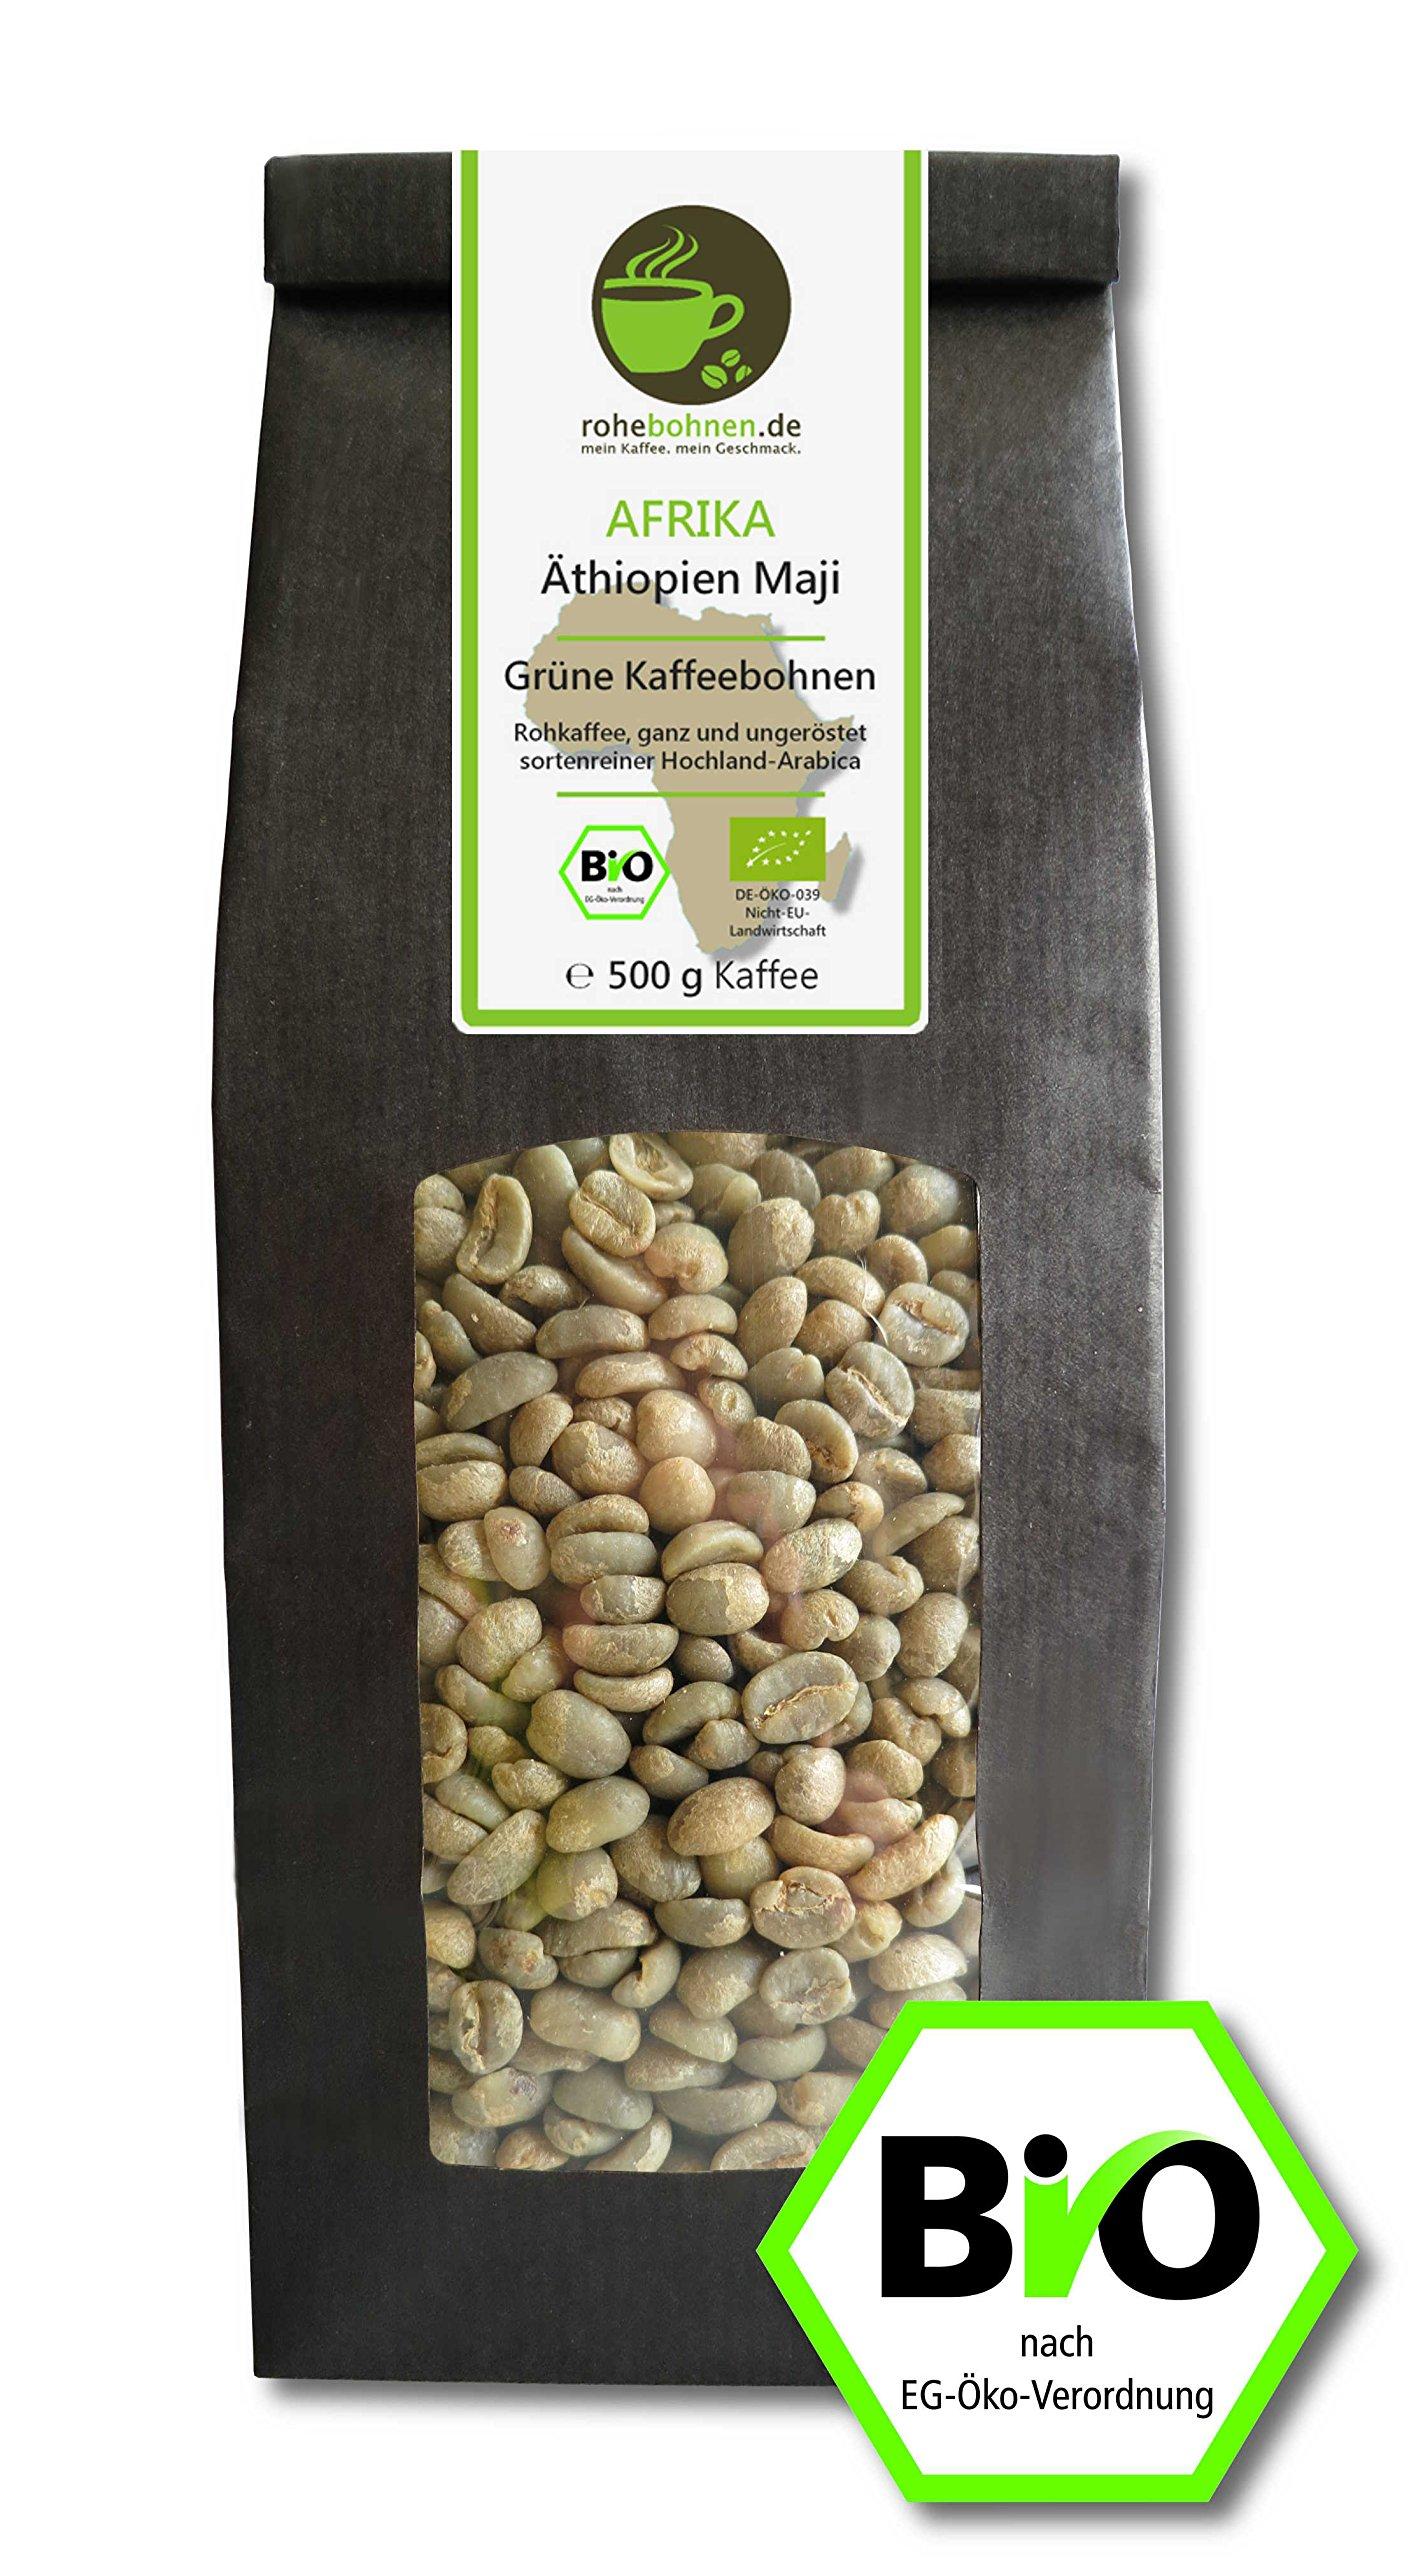 Organic-green-coffee-beans-Arabica-Ethiopia-Maji